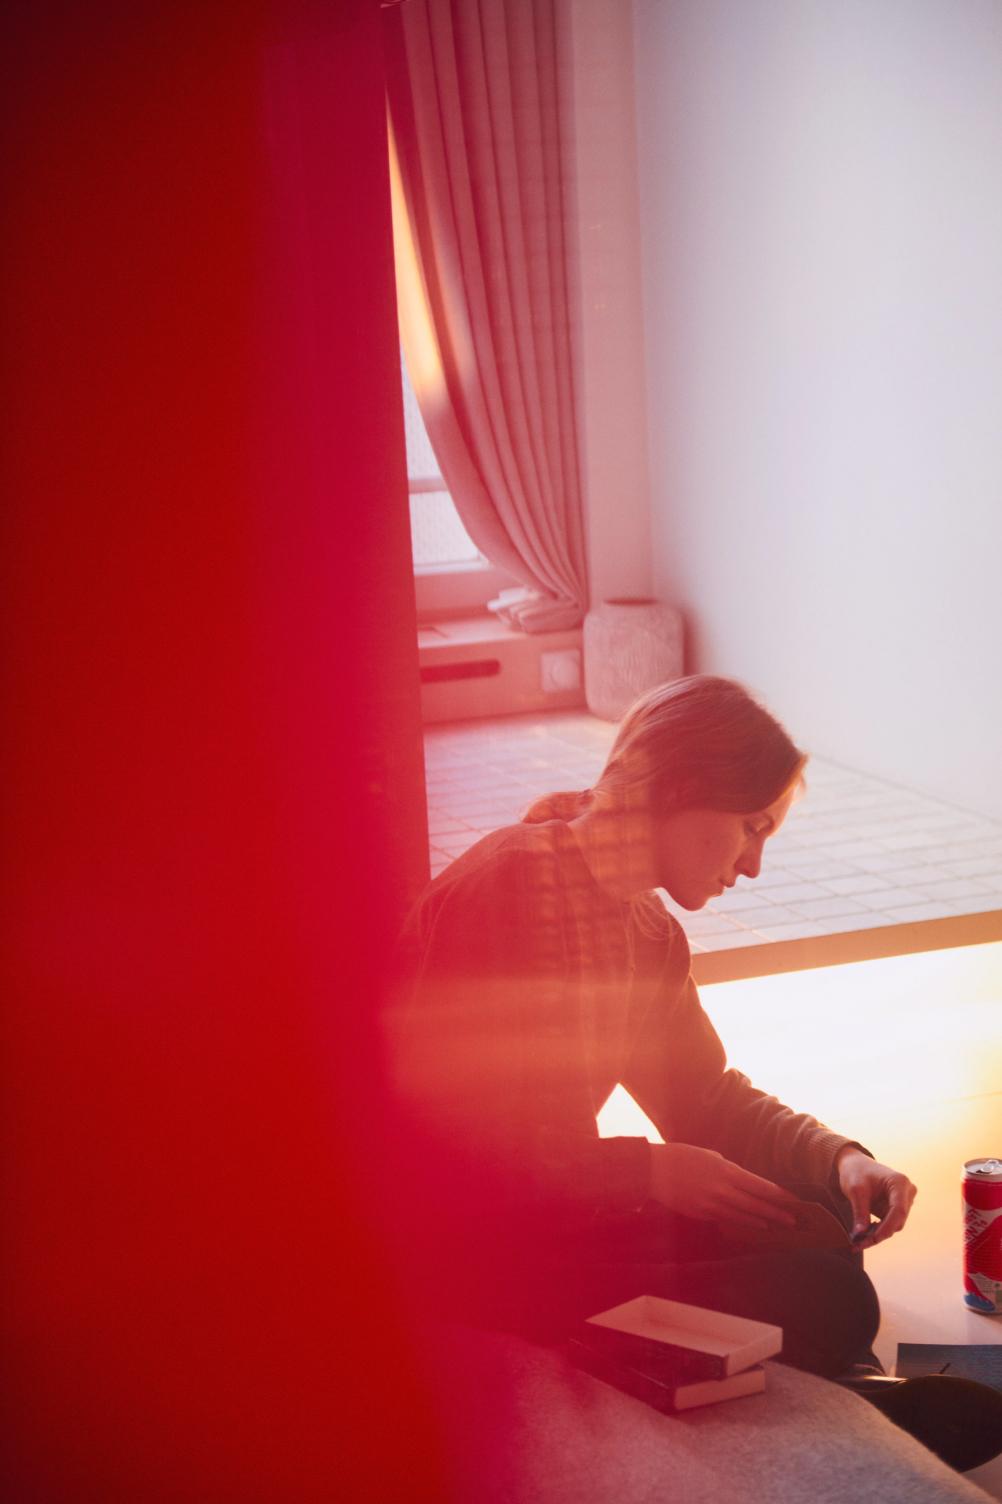 Women sitting in Michelberger Hotel Room